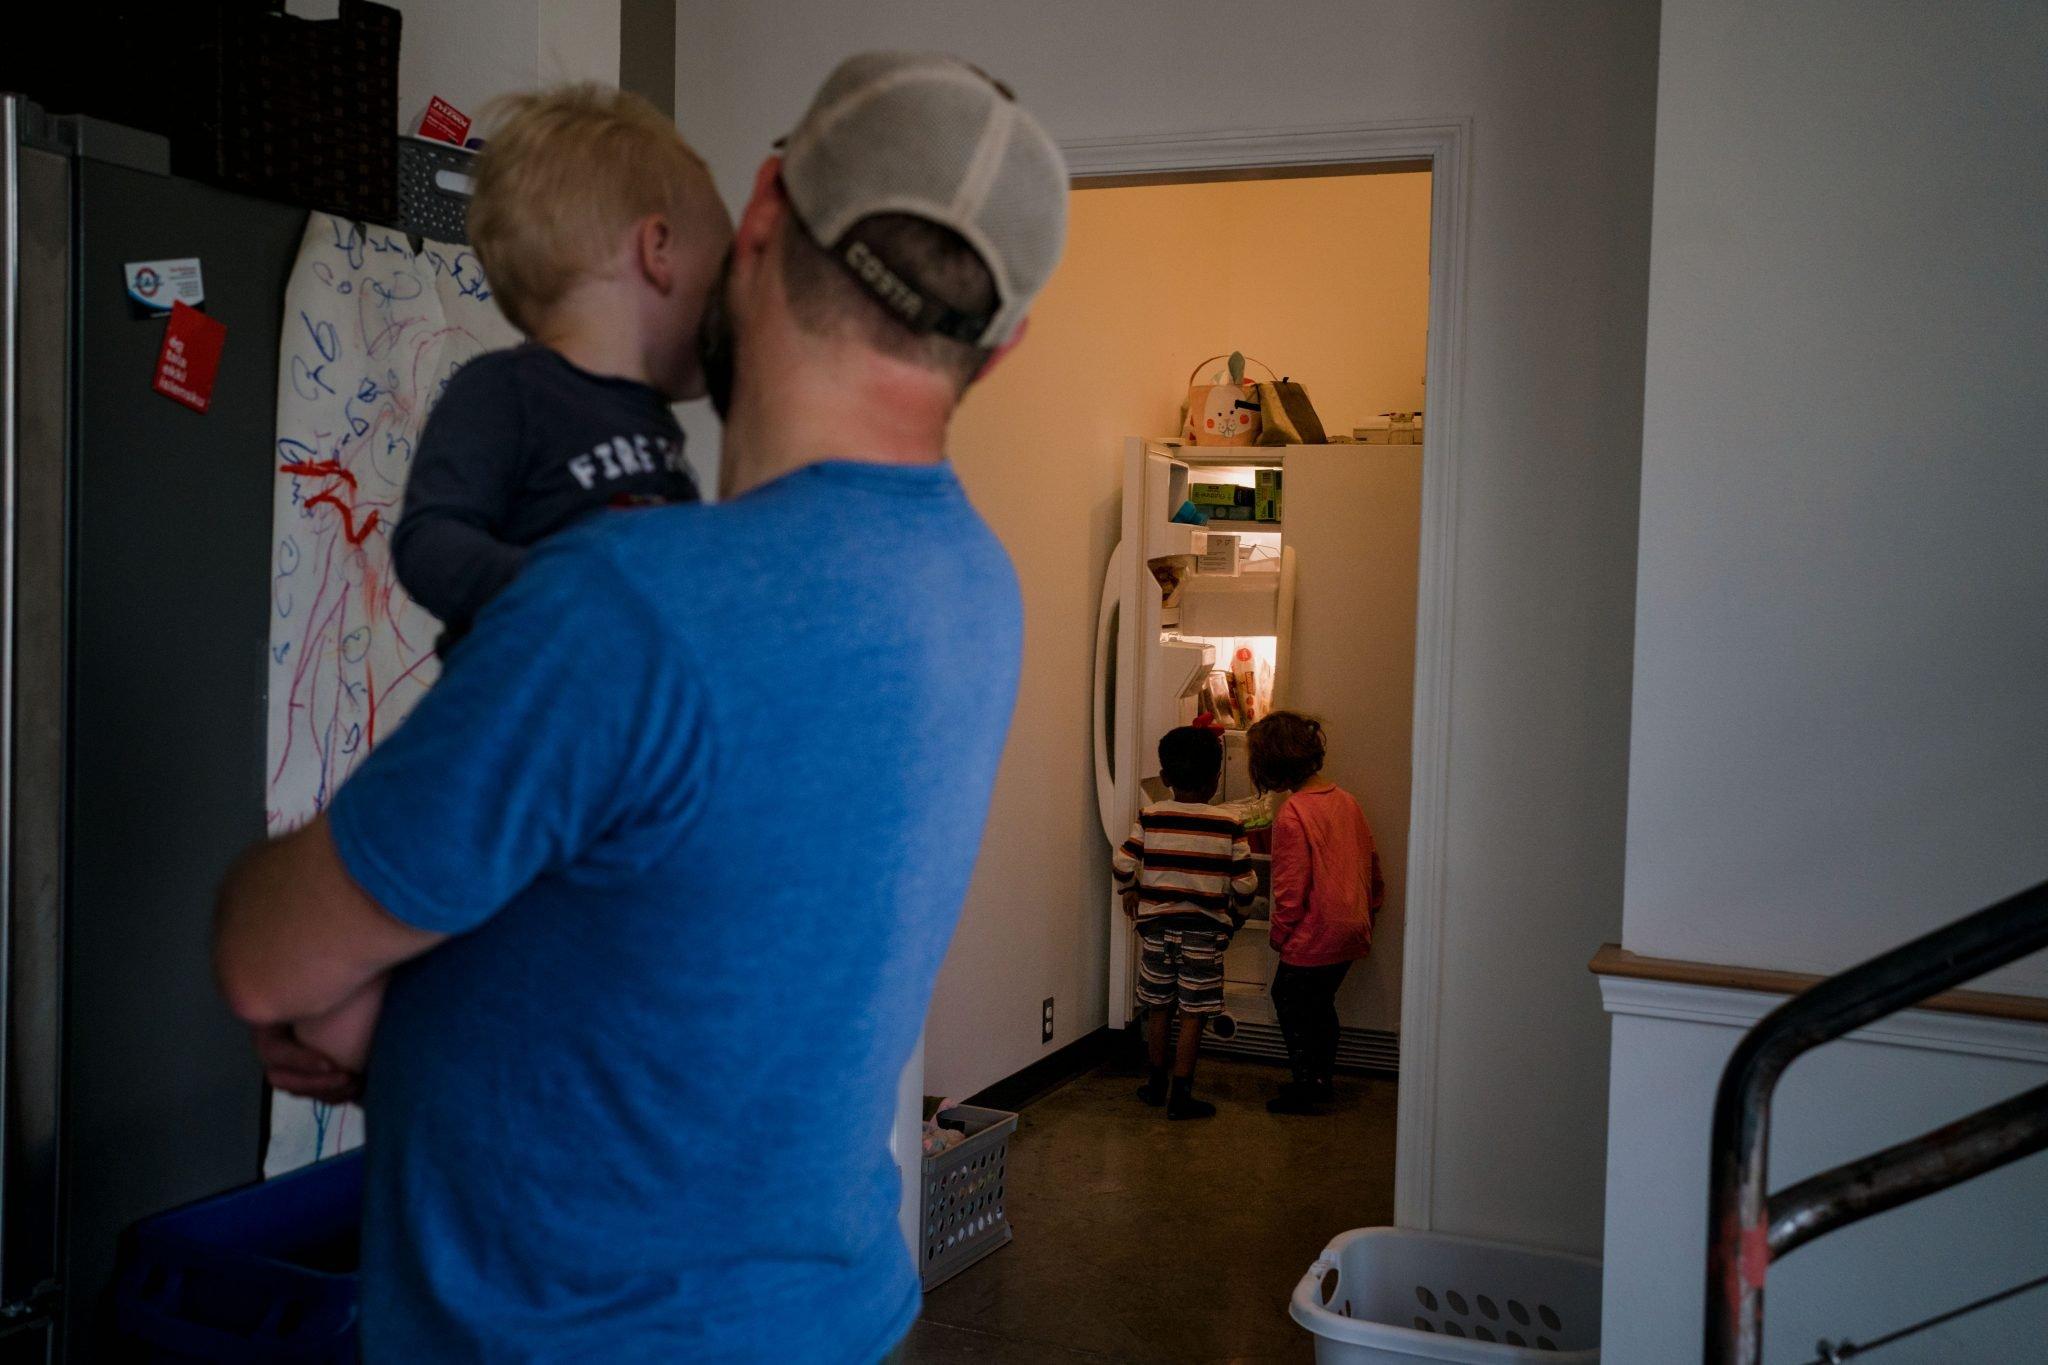 dad watching toddlers climb into fridge